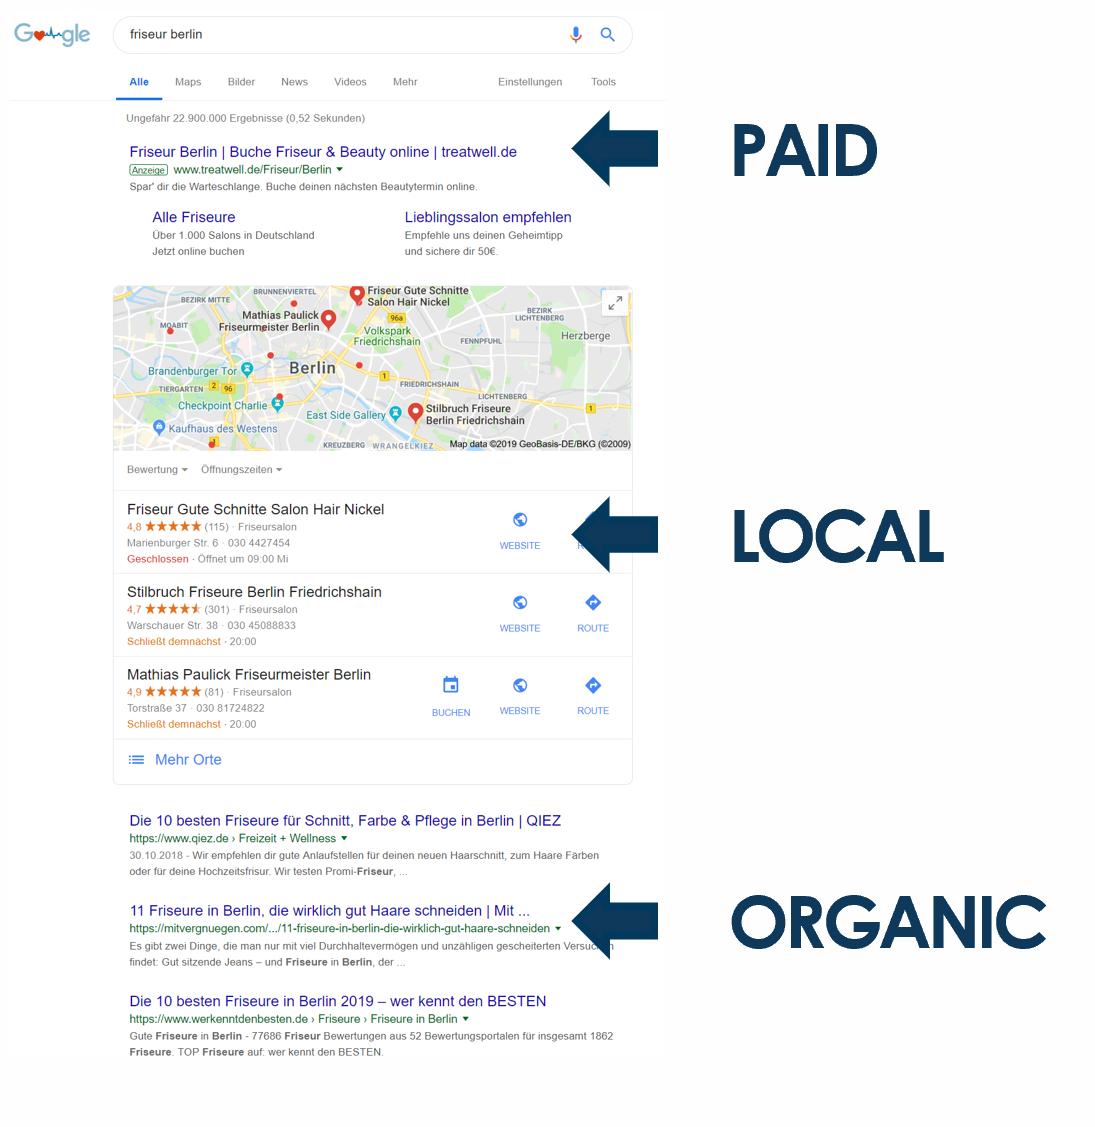 Paid, Local, Organic